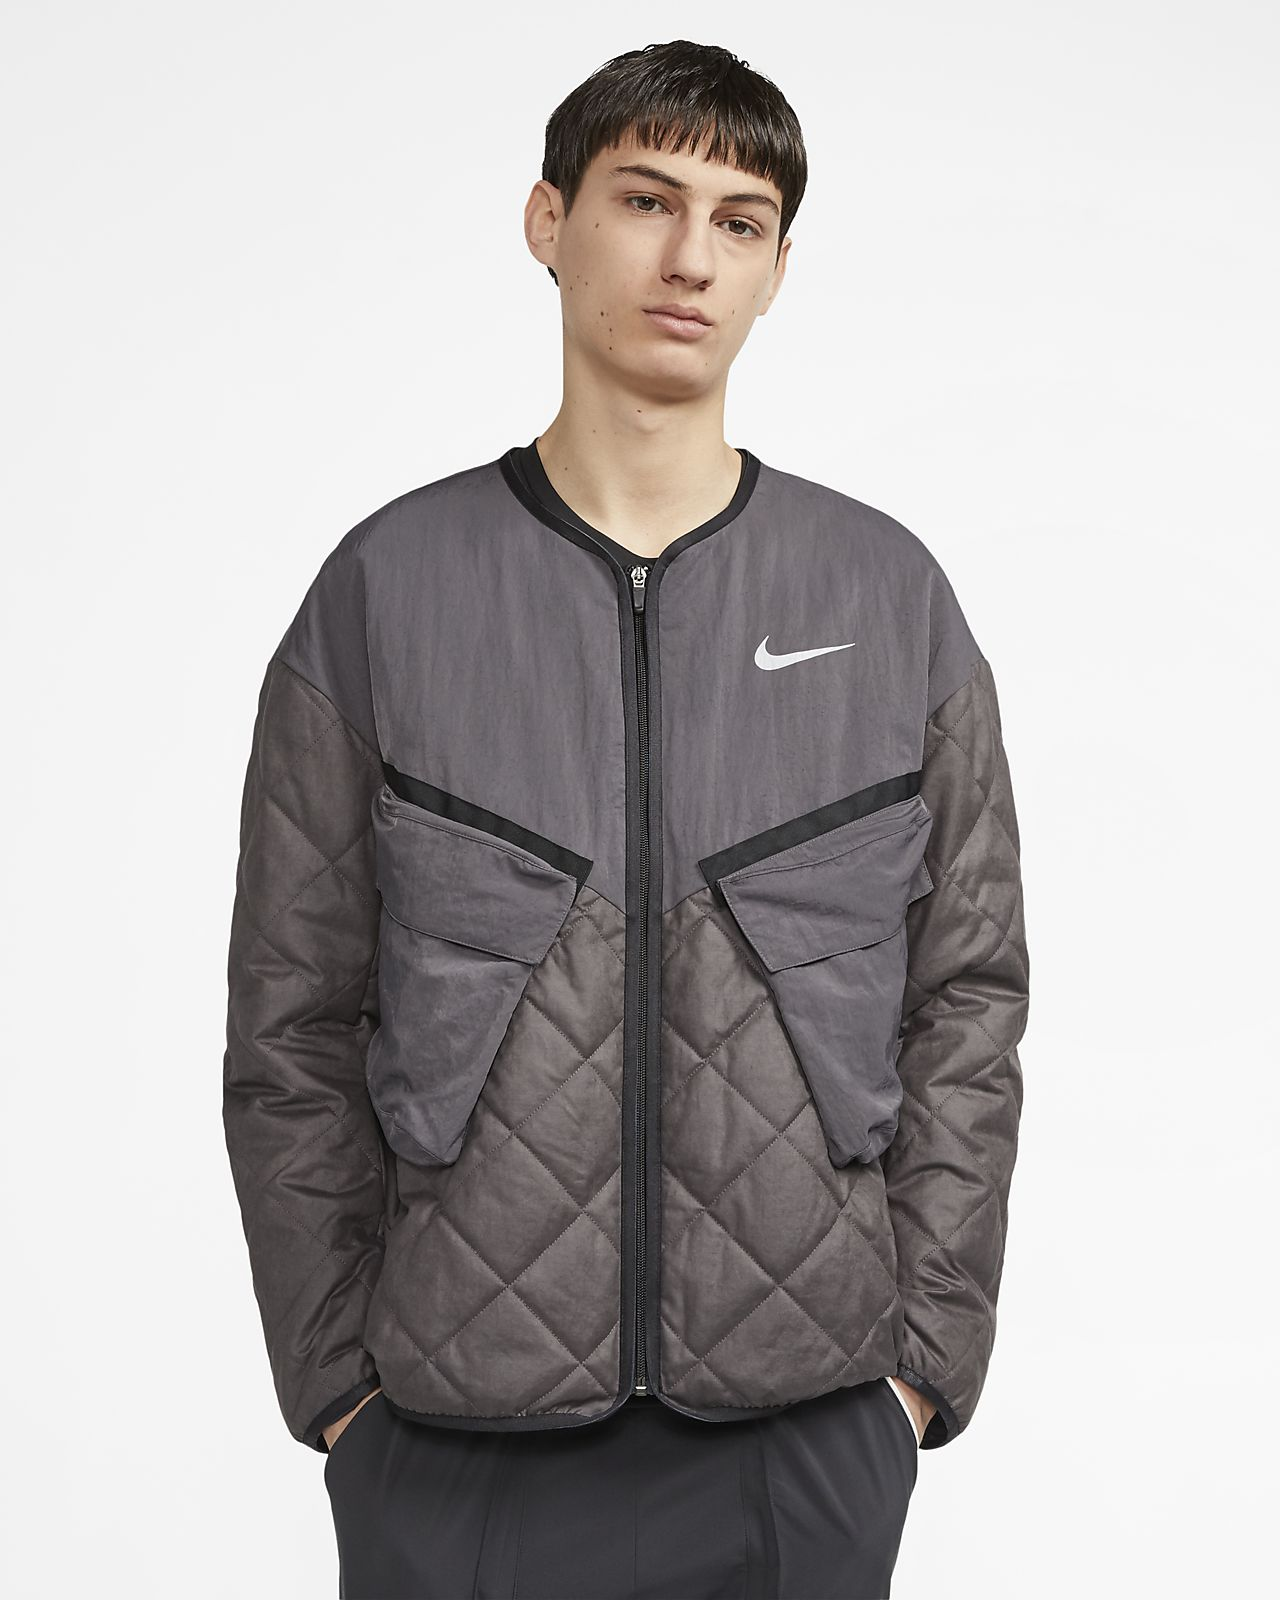 0954758feb8 Nike Run Ready-jakke til mænd. Nike.com DK